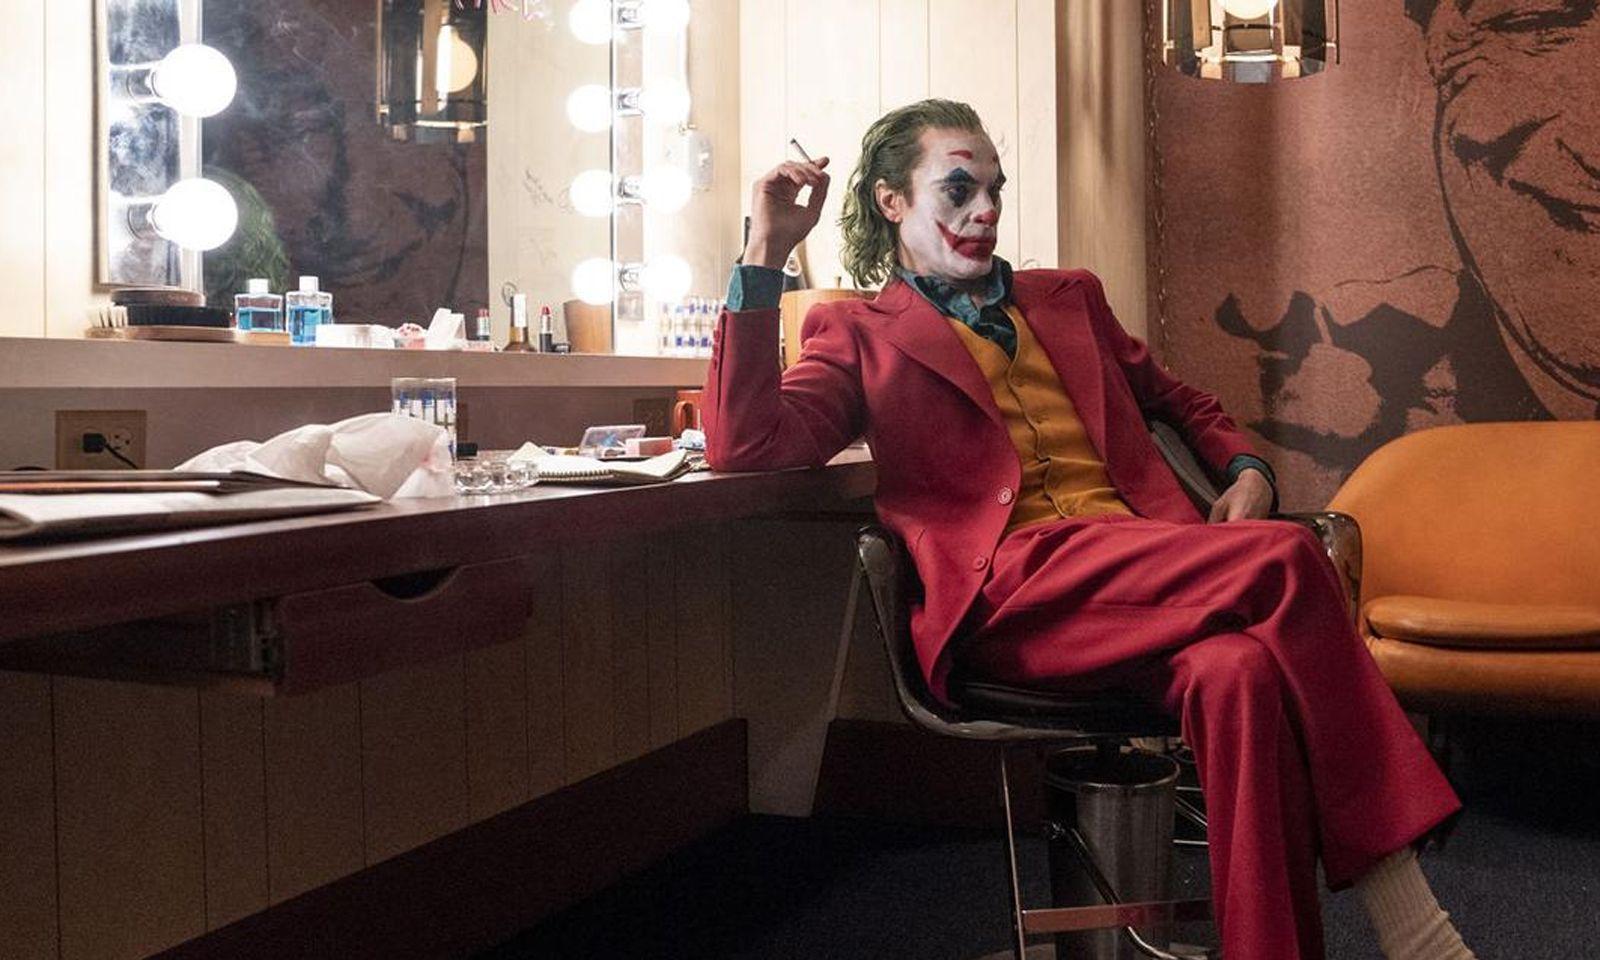 Joaquin Phoenix brilliert als mitleiderregender Superböser in spe.